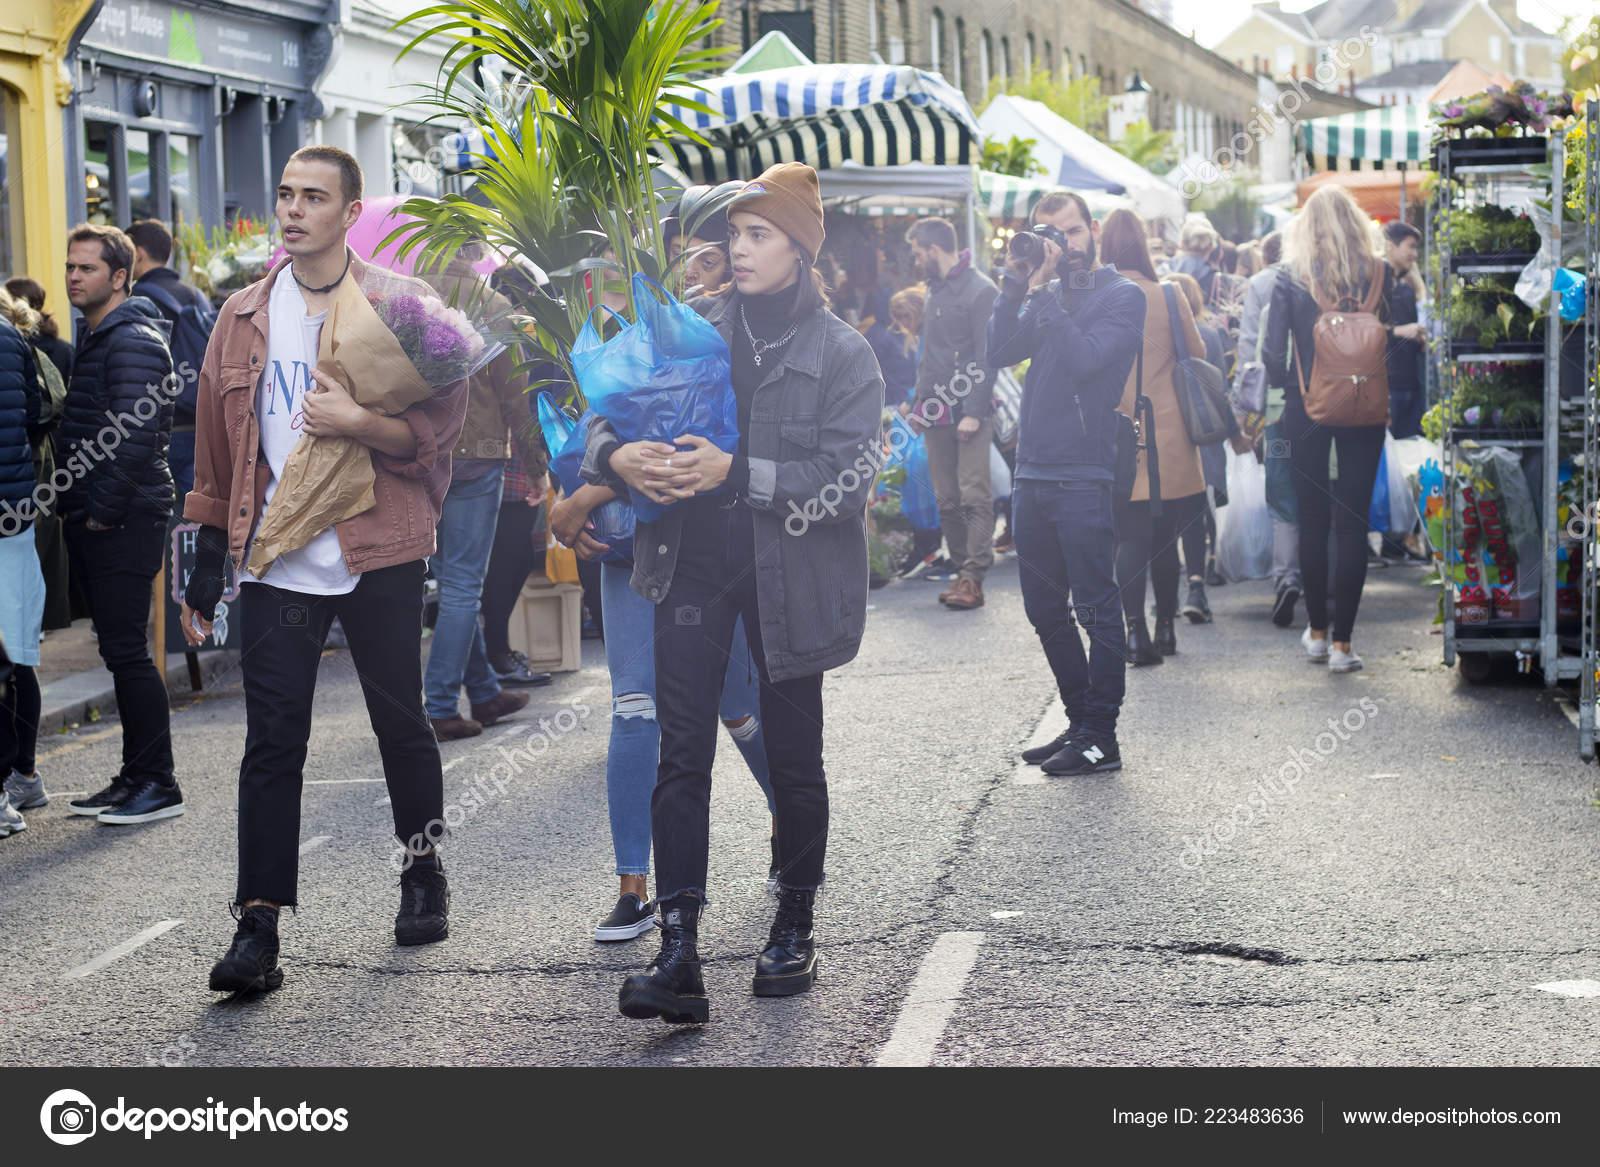 c683af84b28e Λονδίνο Αγγλία Οκτωβρίου 2018 Εφηβική Παρέα Περπάτημα Στο Περίφημο Brick —  Φωτογραφία Αρχείου